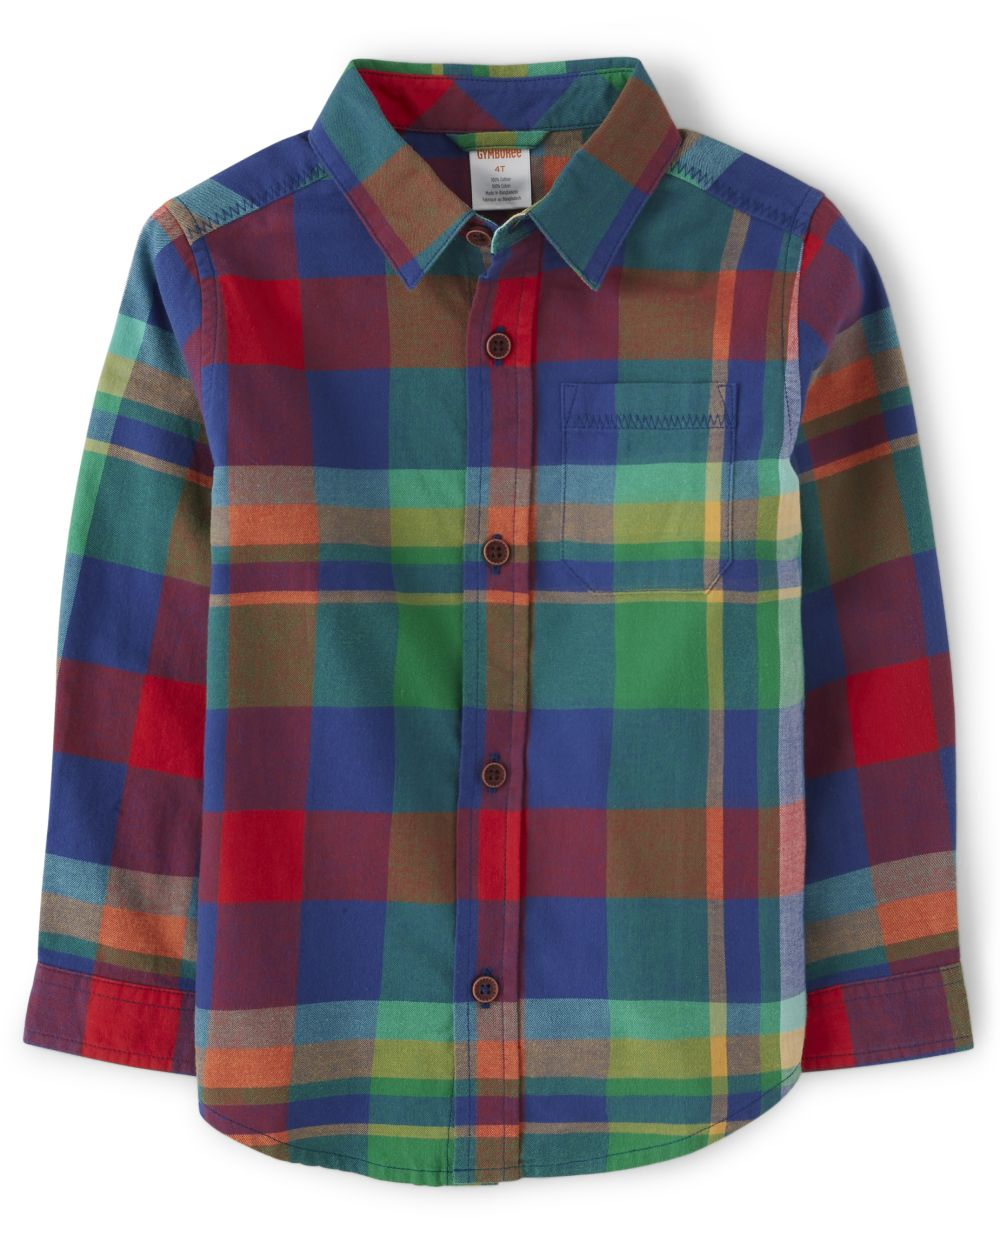 Boys Plaid Button Up Shirt - Dino Roar